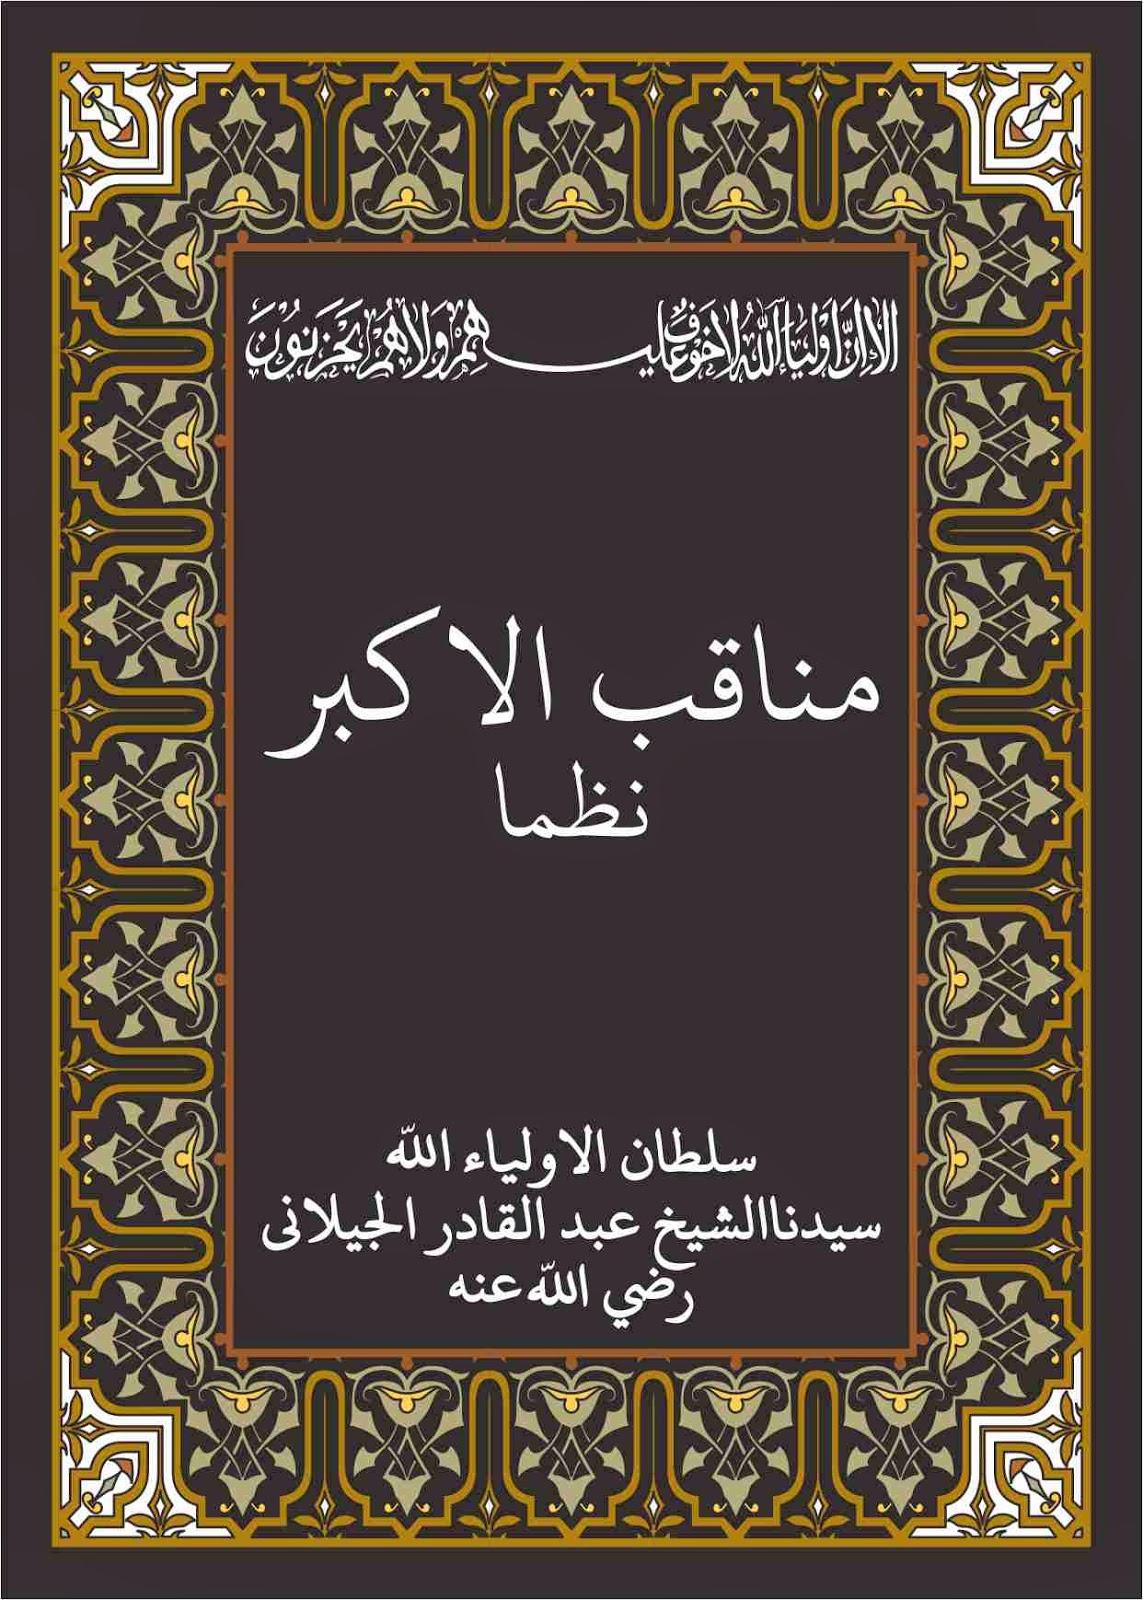 Ebook kitab uyun download qurotul